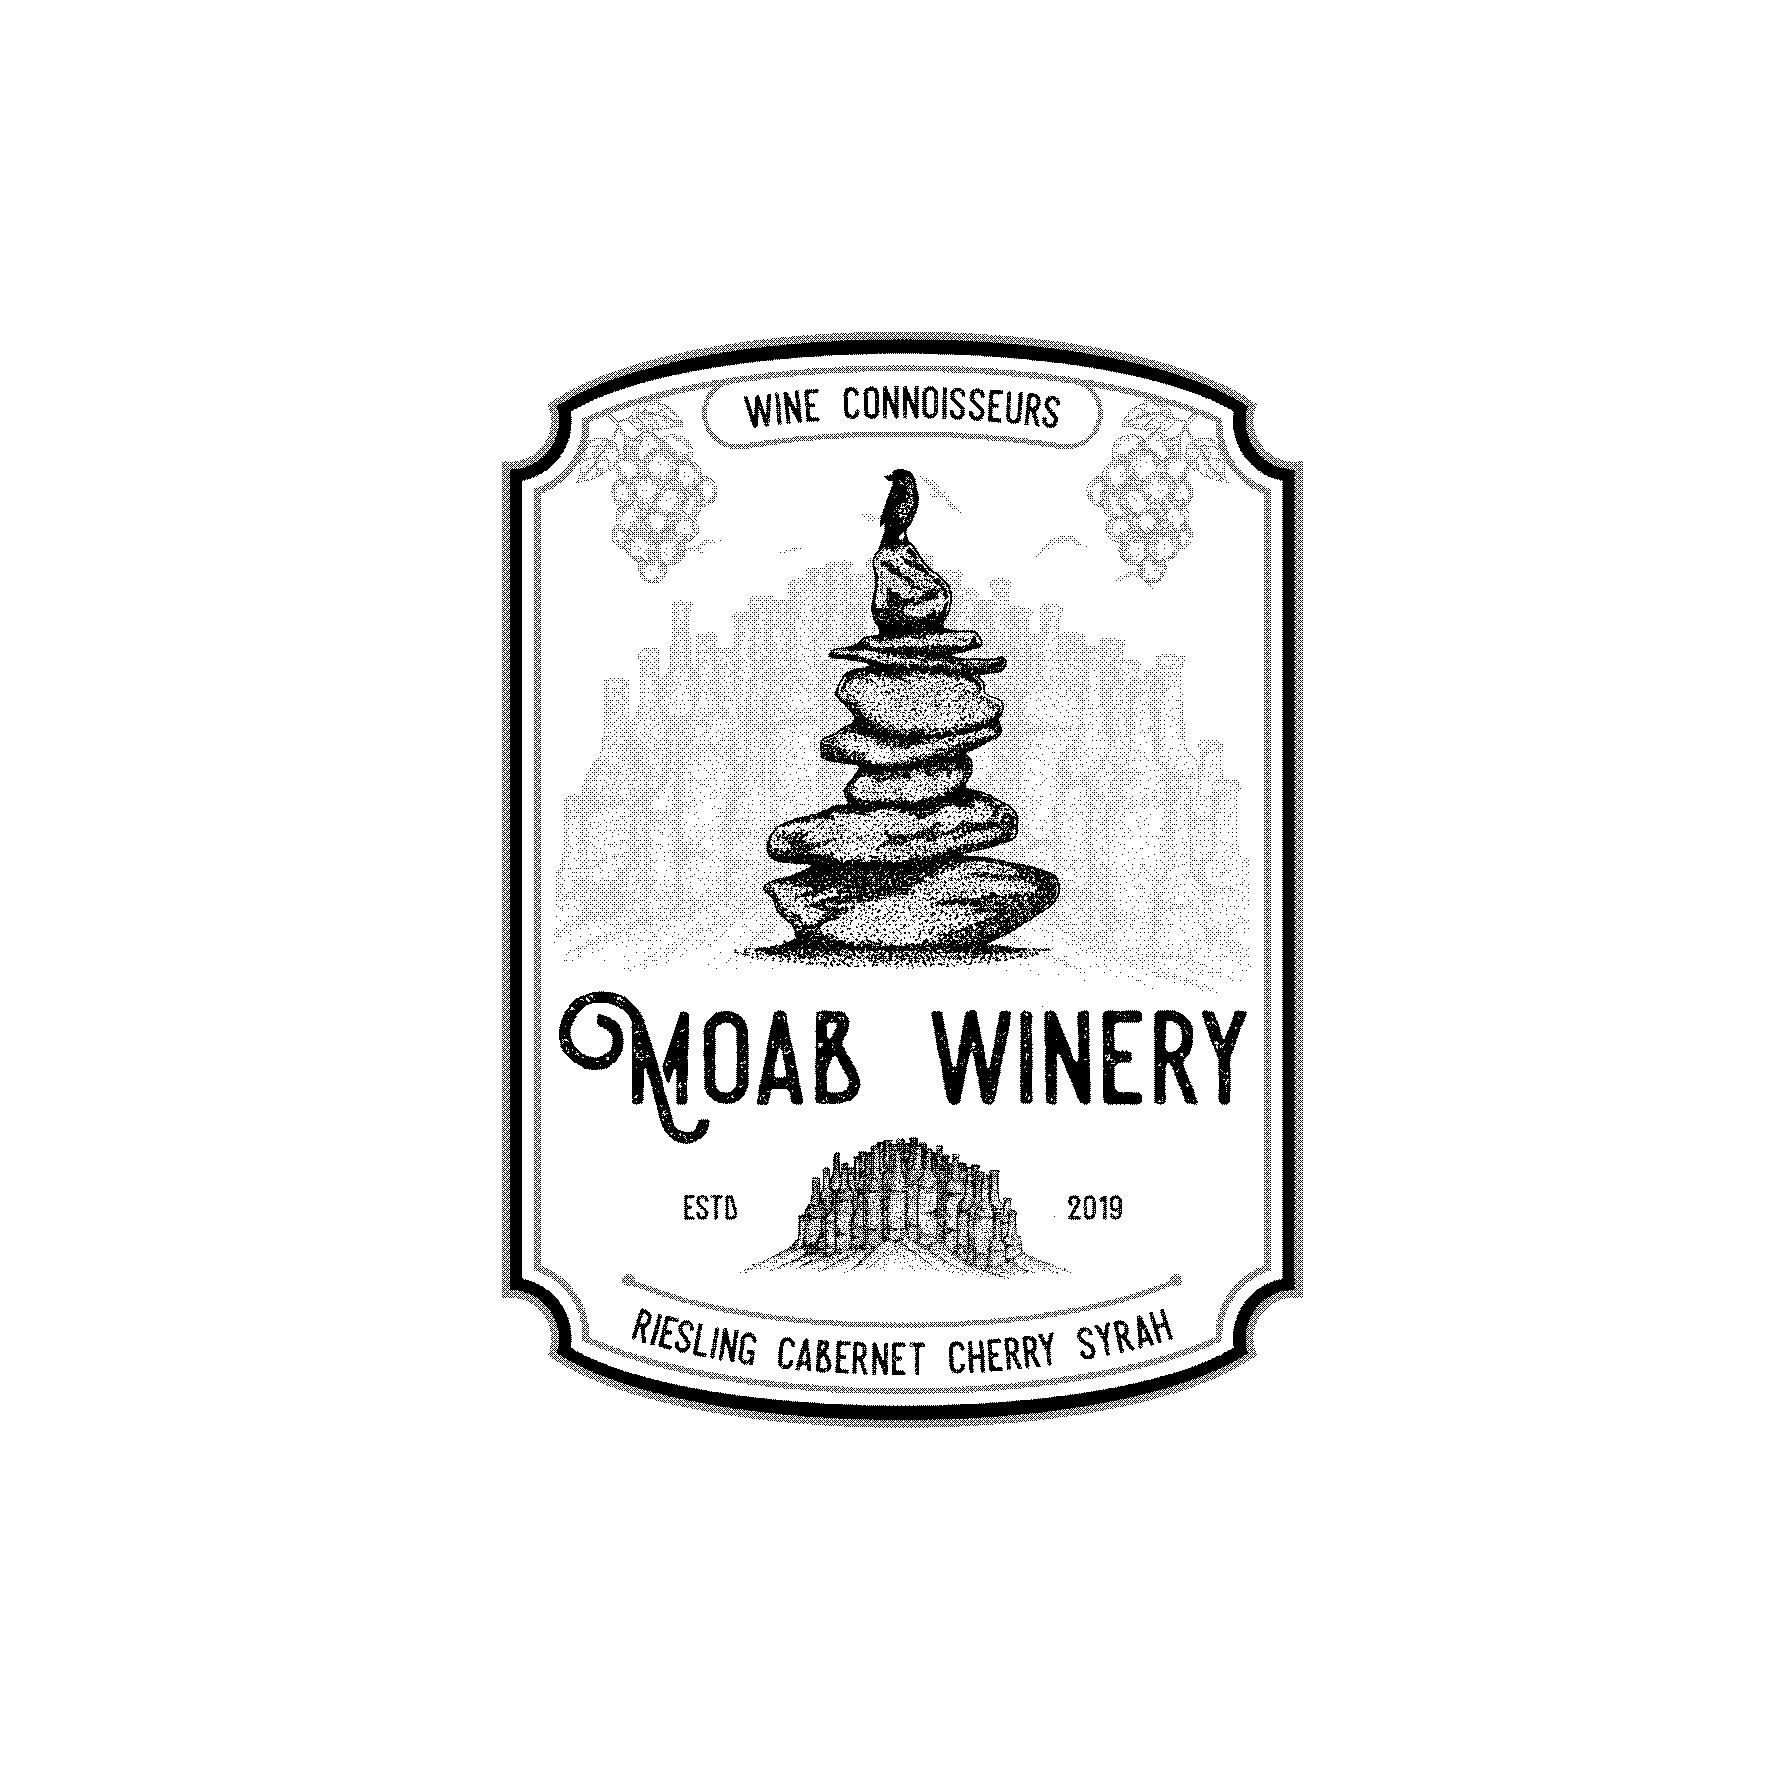 Moab Winery